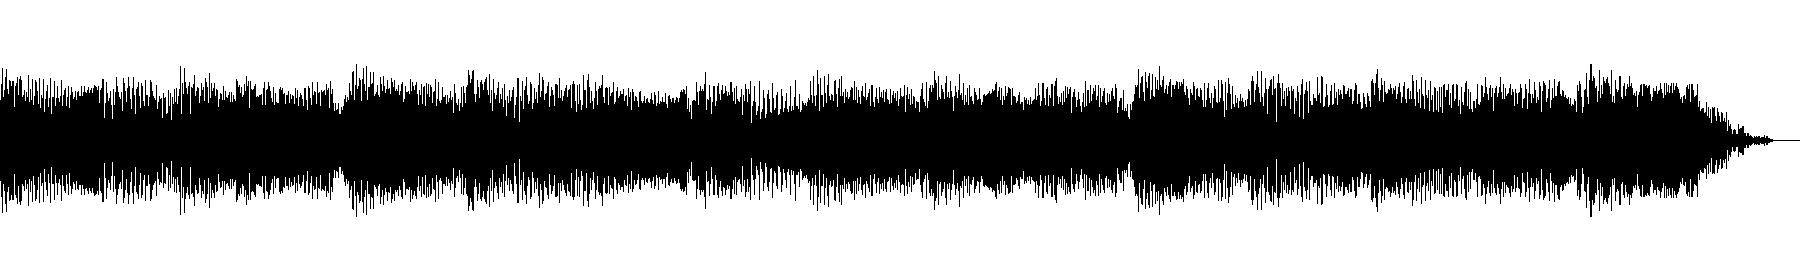 guitarrock03 130